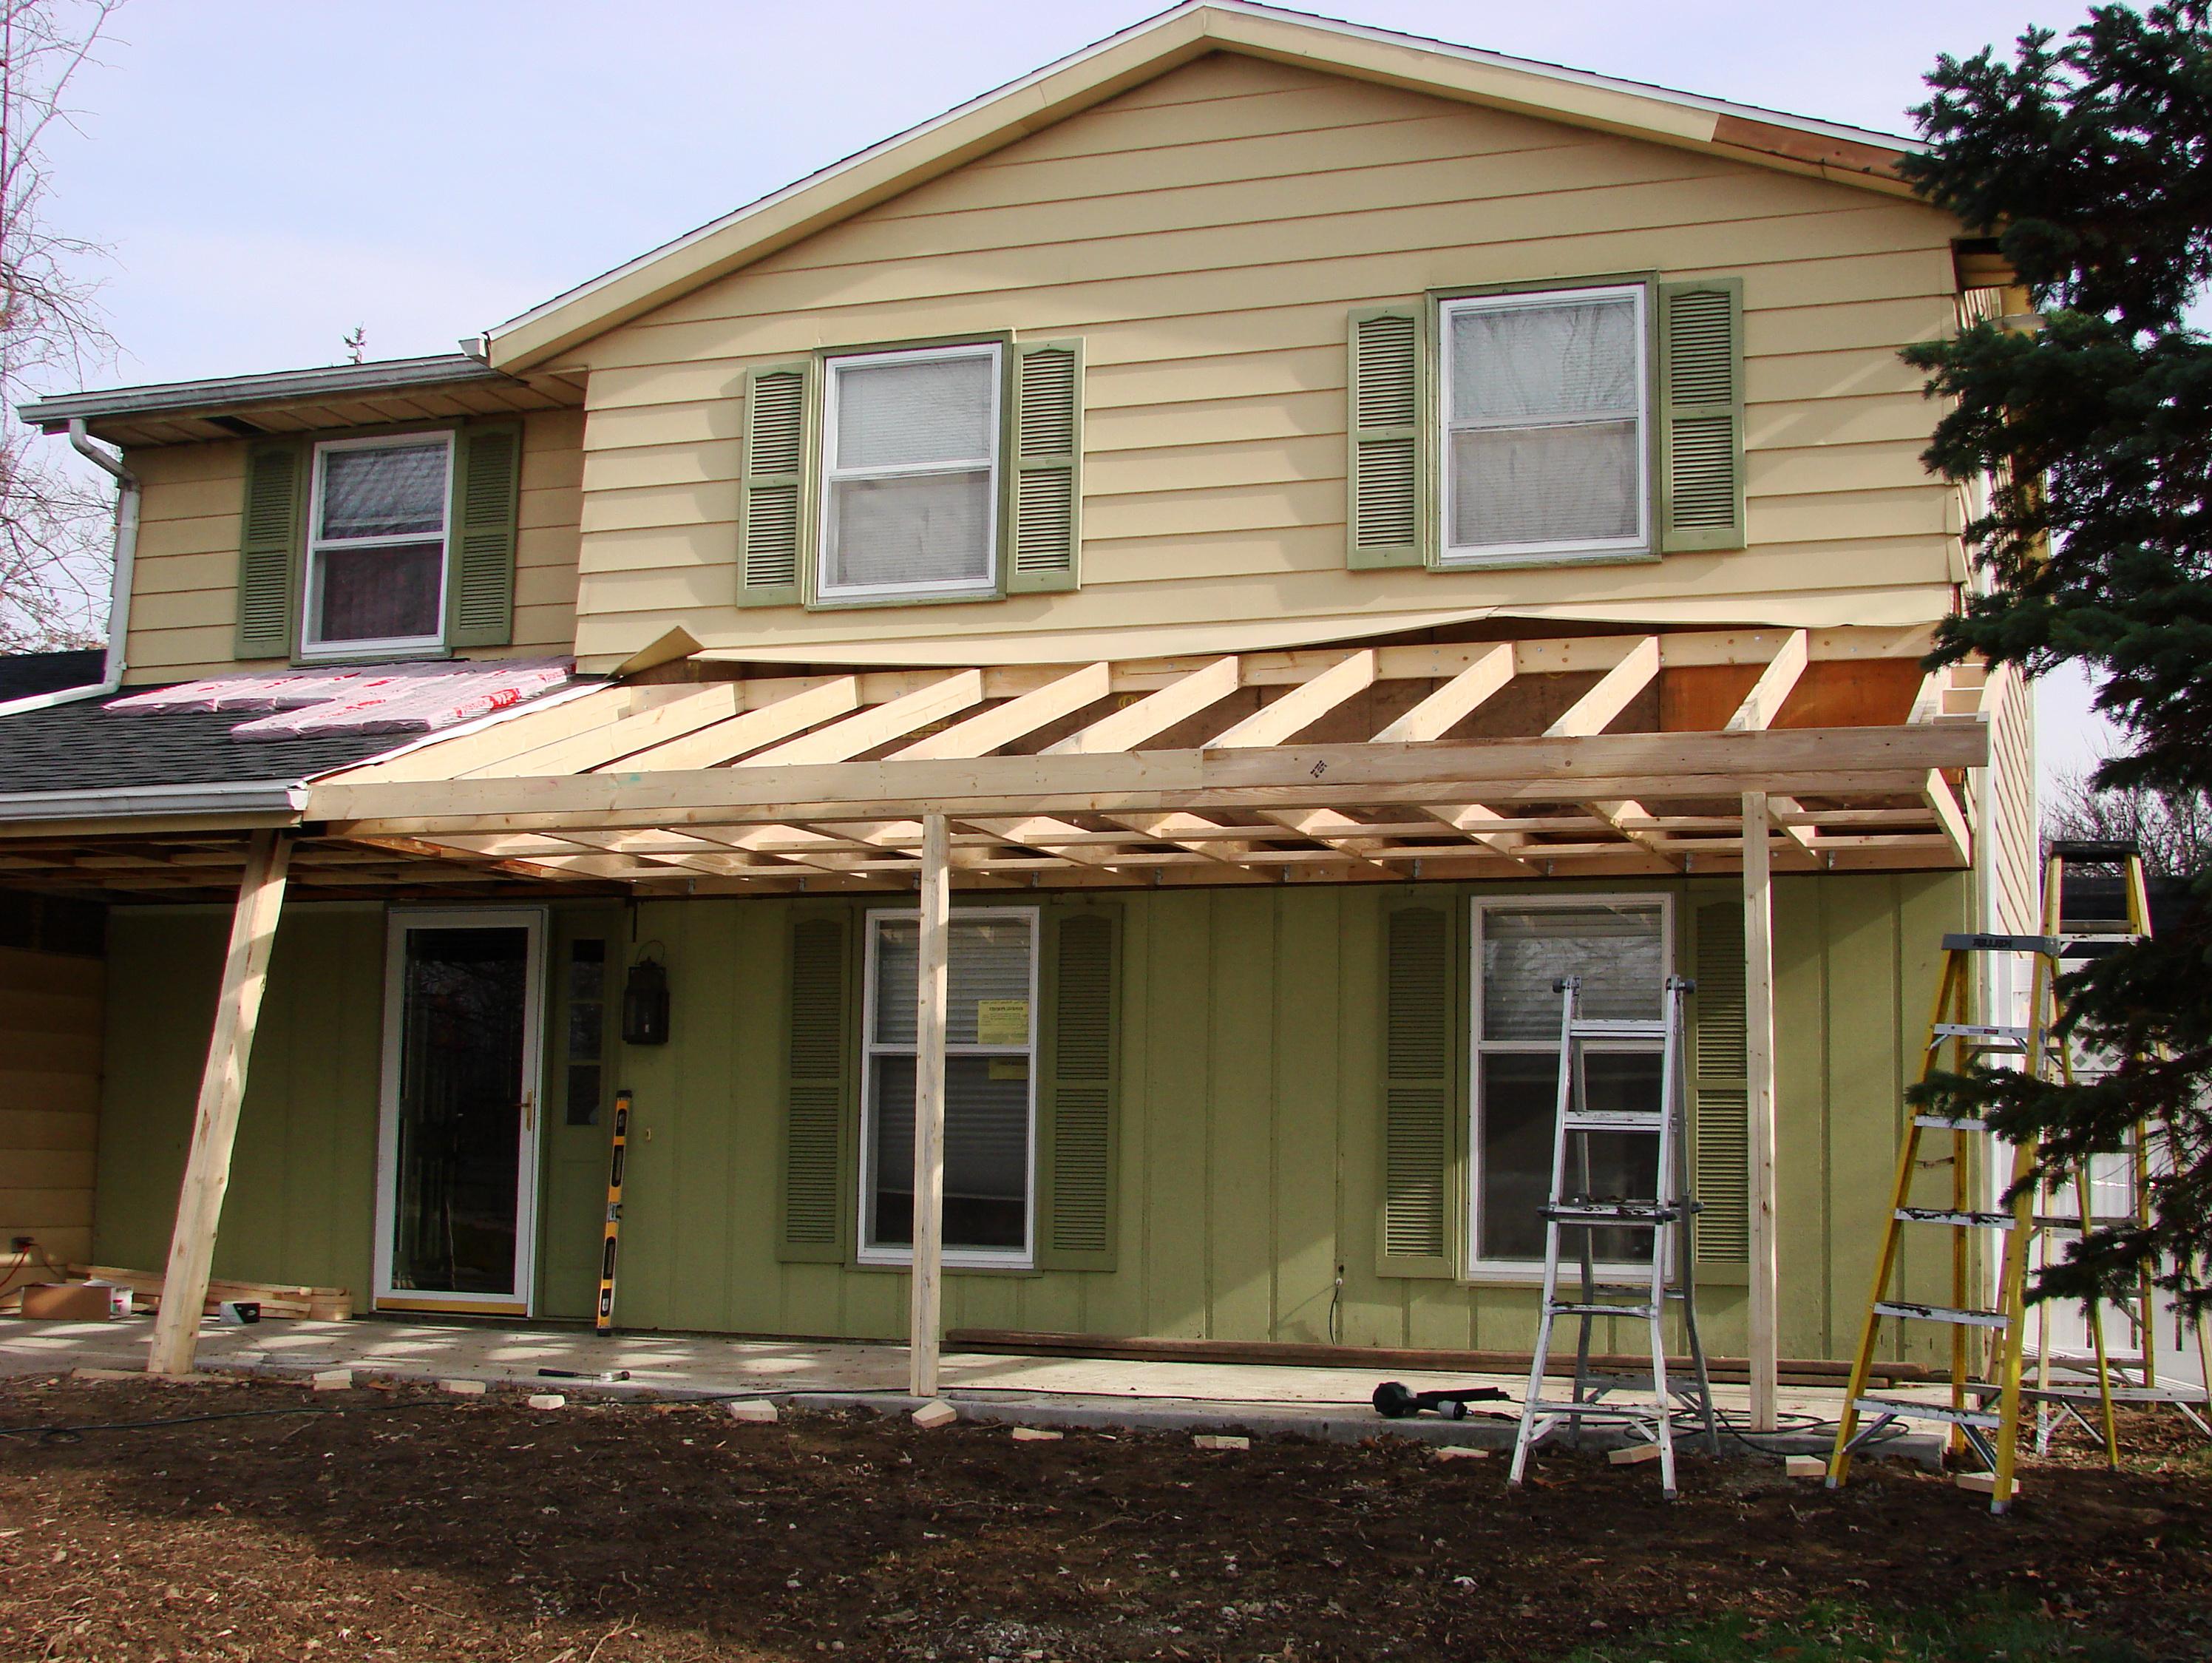 porch roof construction details home design ideas regarding size 2992 x 2249 - Porch Roof Framing